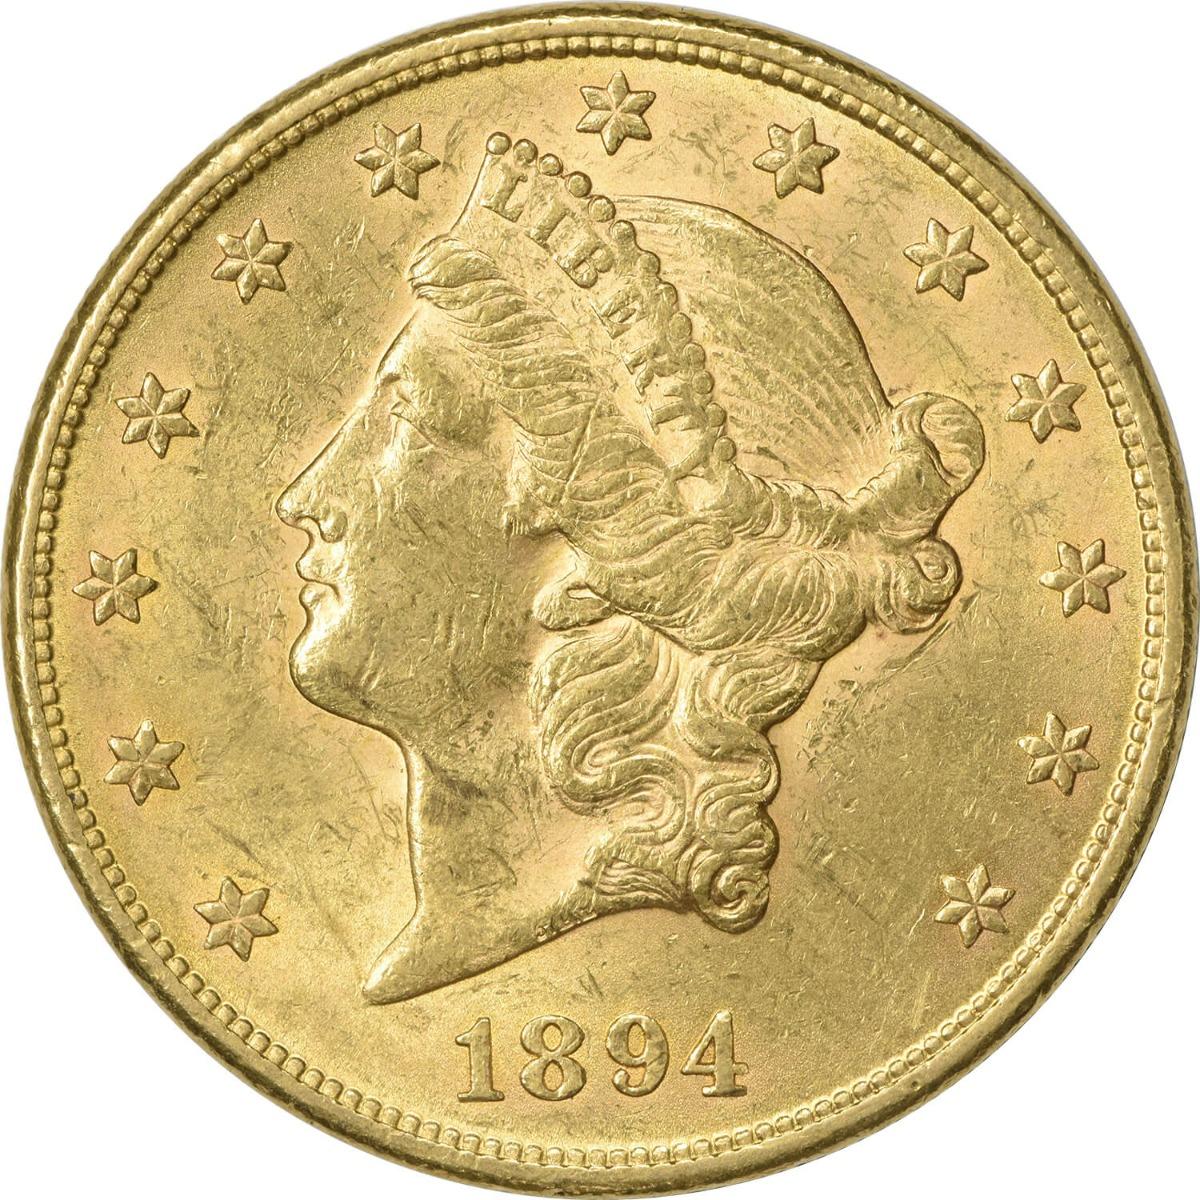 1894 $20 Gold Liberty Head AU58 Uncertified